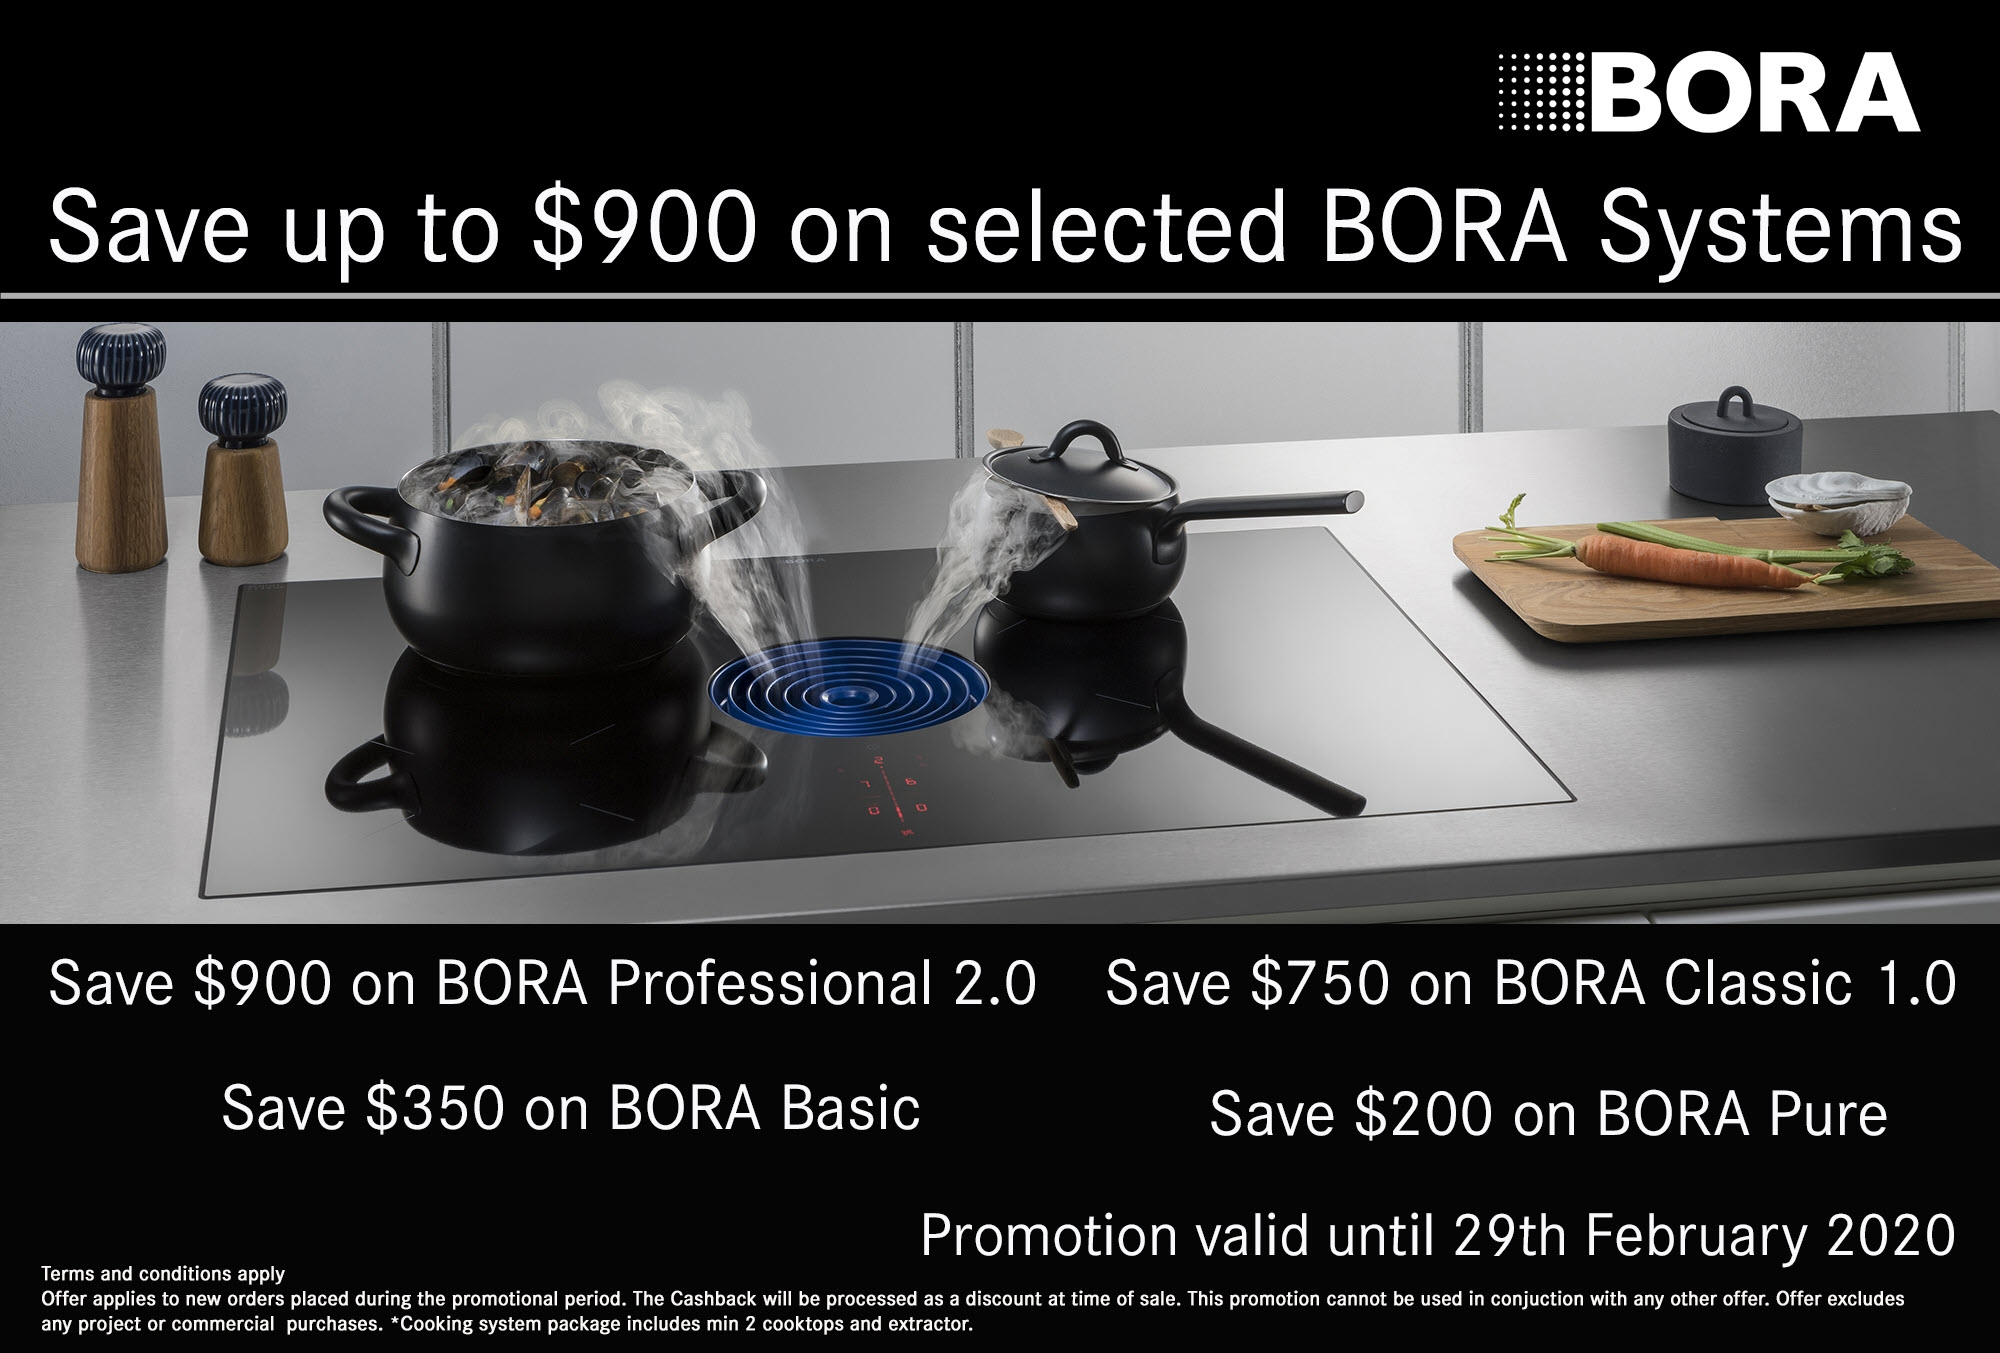 Bora Promotion Jan 2020 Feb 2020